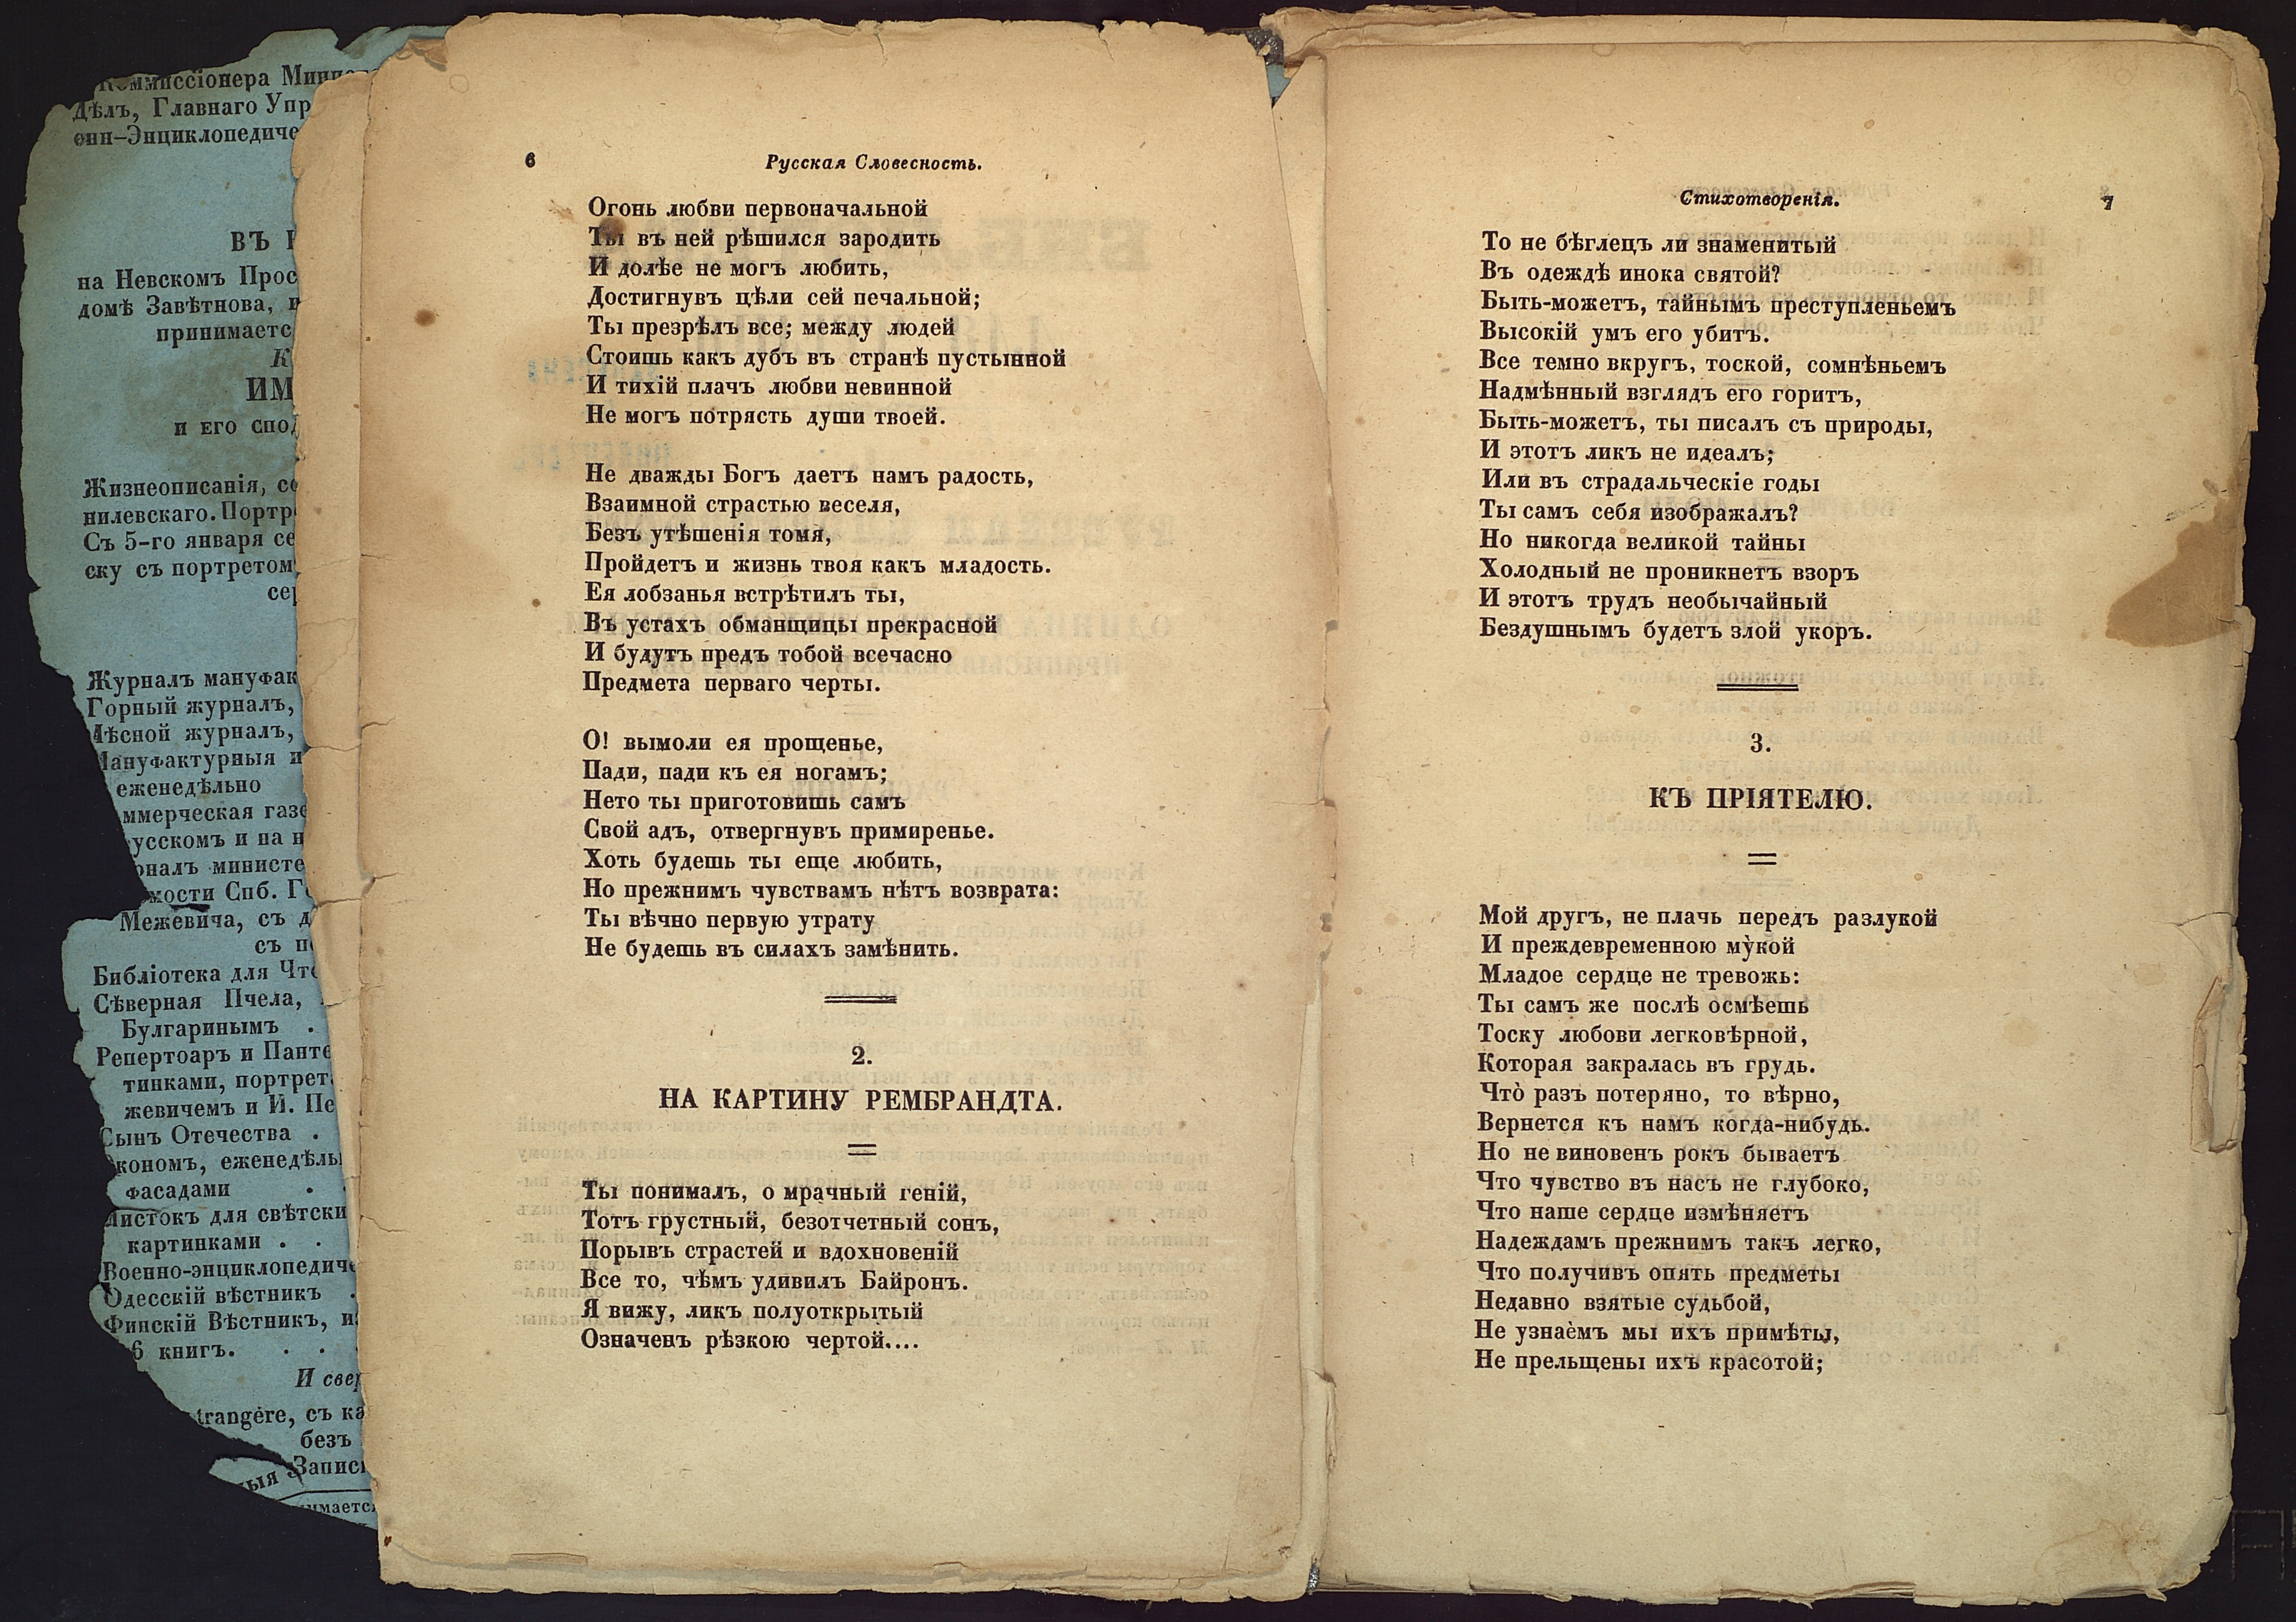 ЛОК-5119 ТАРХАНЫ КП-11026  Журнал Библиотека для чтения. Т. 68._3